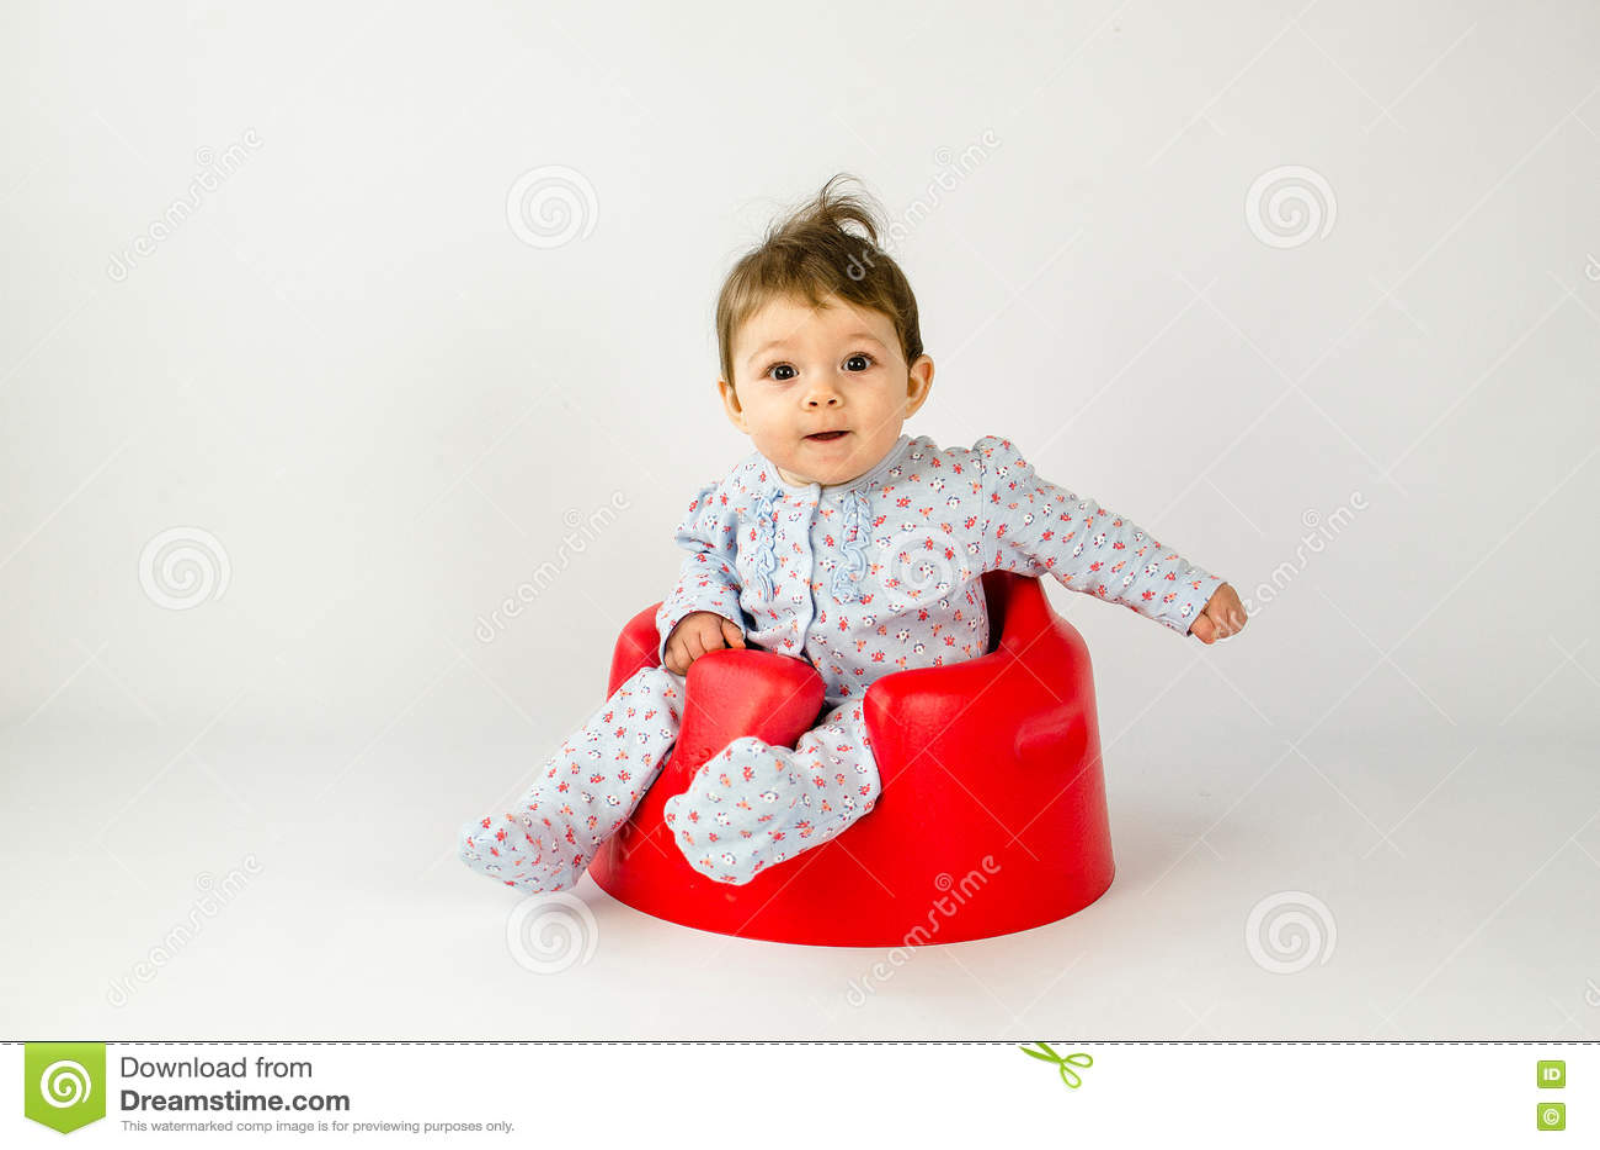 Amazing Plastic Baby Seat Images - Bathtub for Bathroom Ideas ...